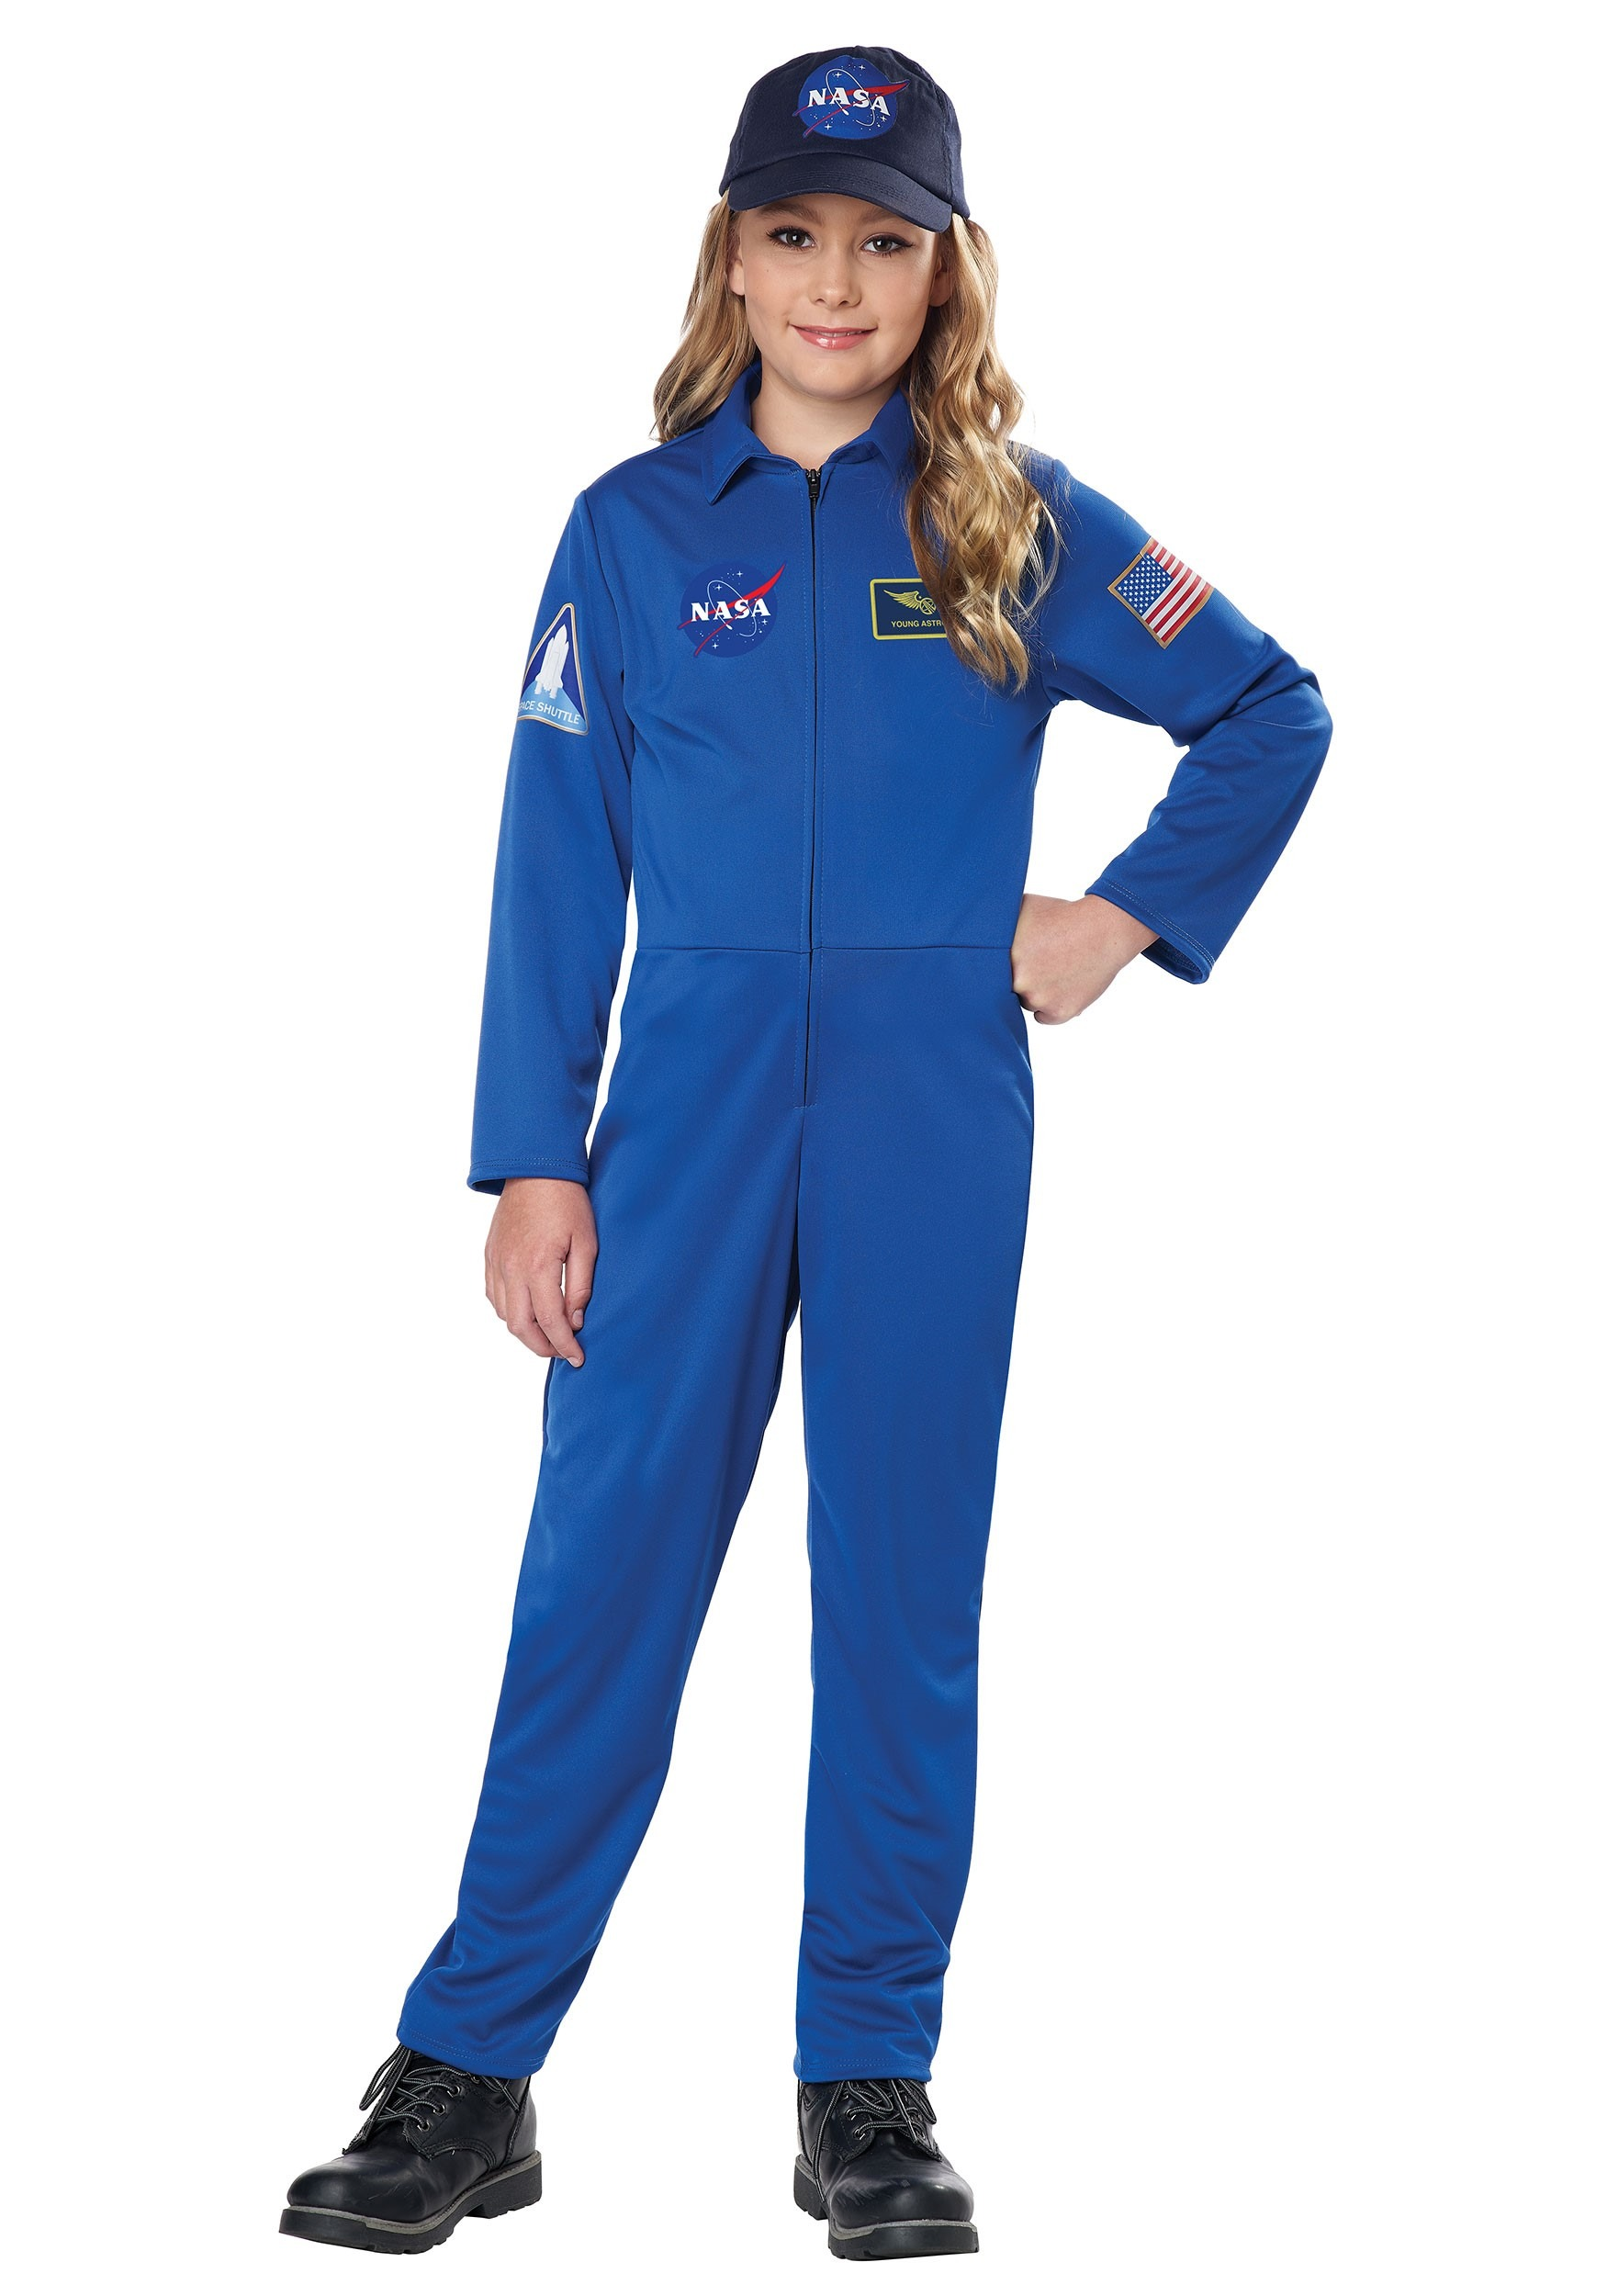 Adult Orange Astronaut Nasa Jumpsuit Mens Space Shuttle Suit Costume Aviation